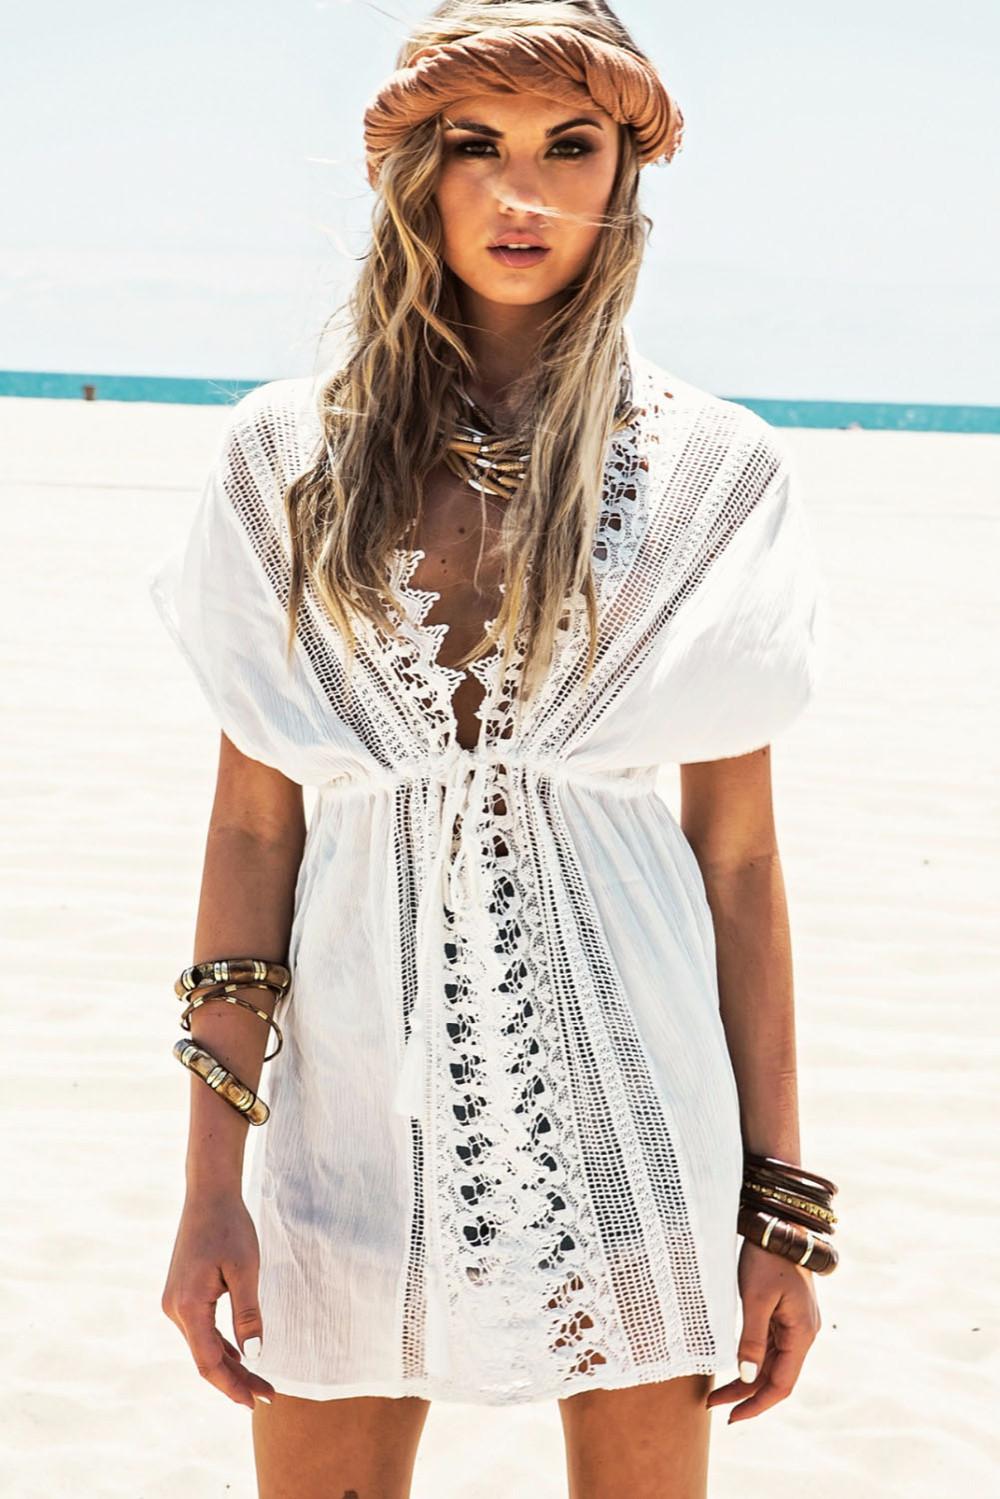 d194fa18f47cc White Short Sleeve V Neck Cotton Beach Caftans